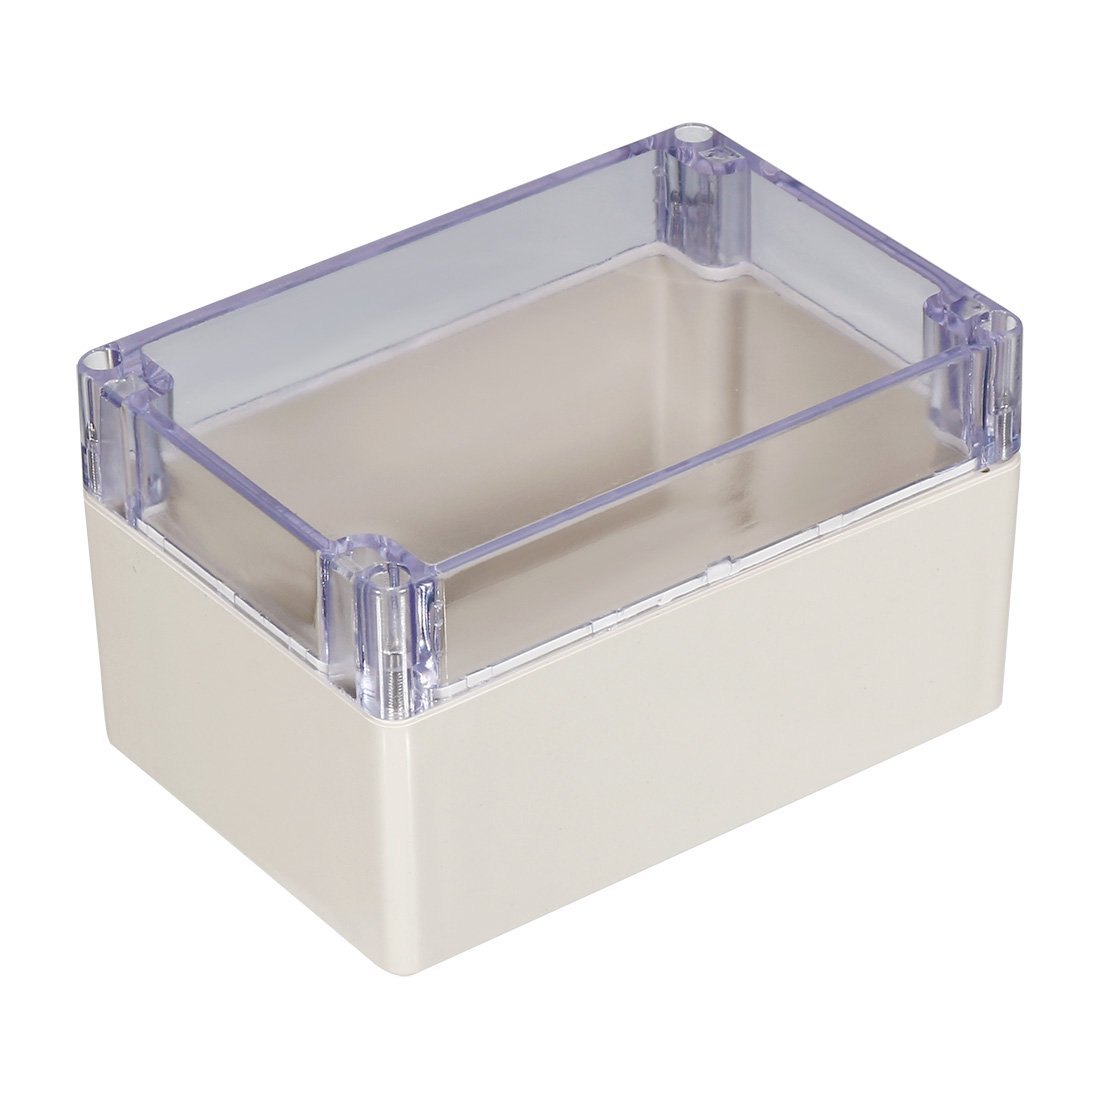 sourcing map 160 110 90mm Elektro ABS Plastik DIY Junktion Box geschlossen Deckel klar